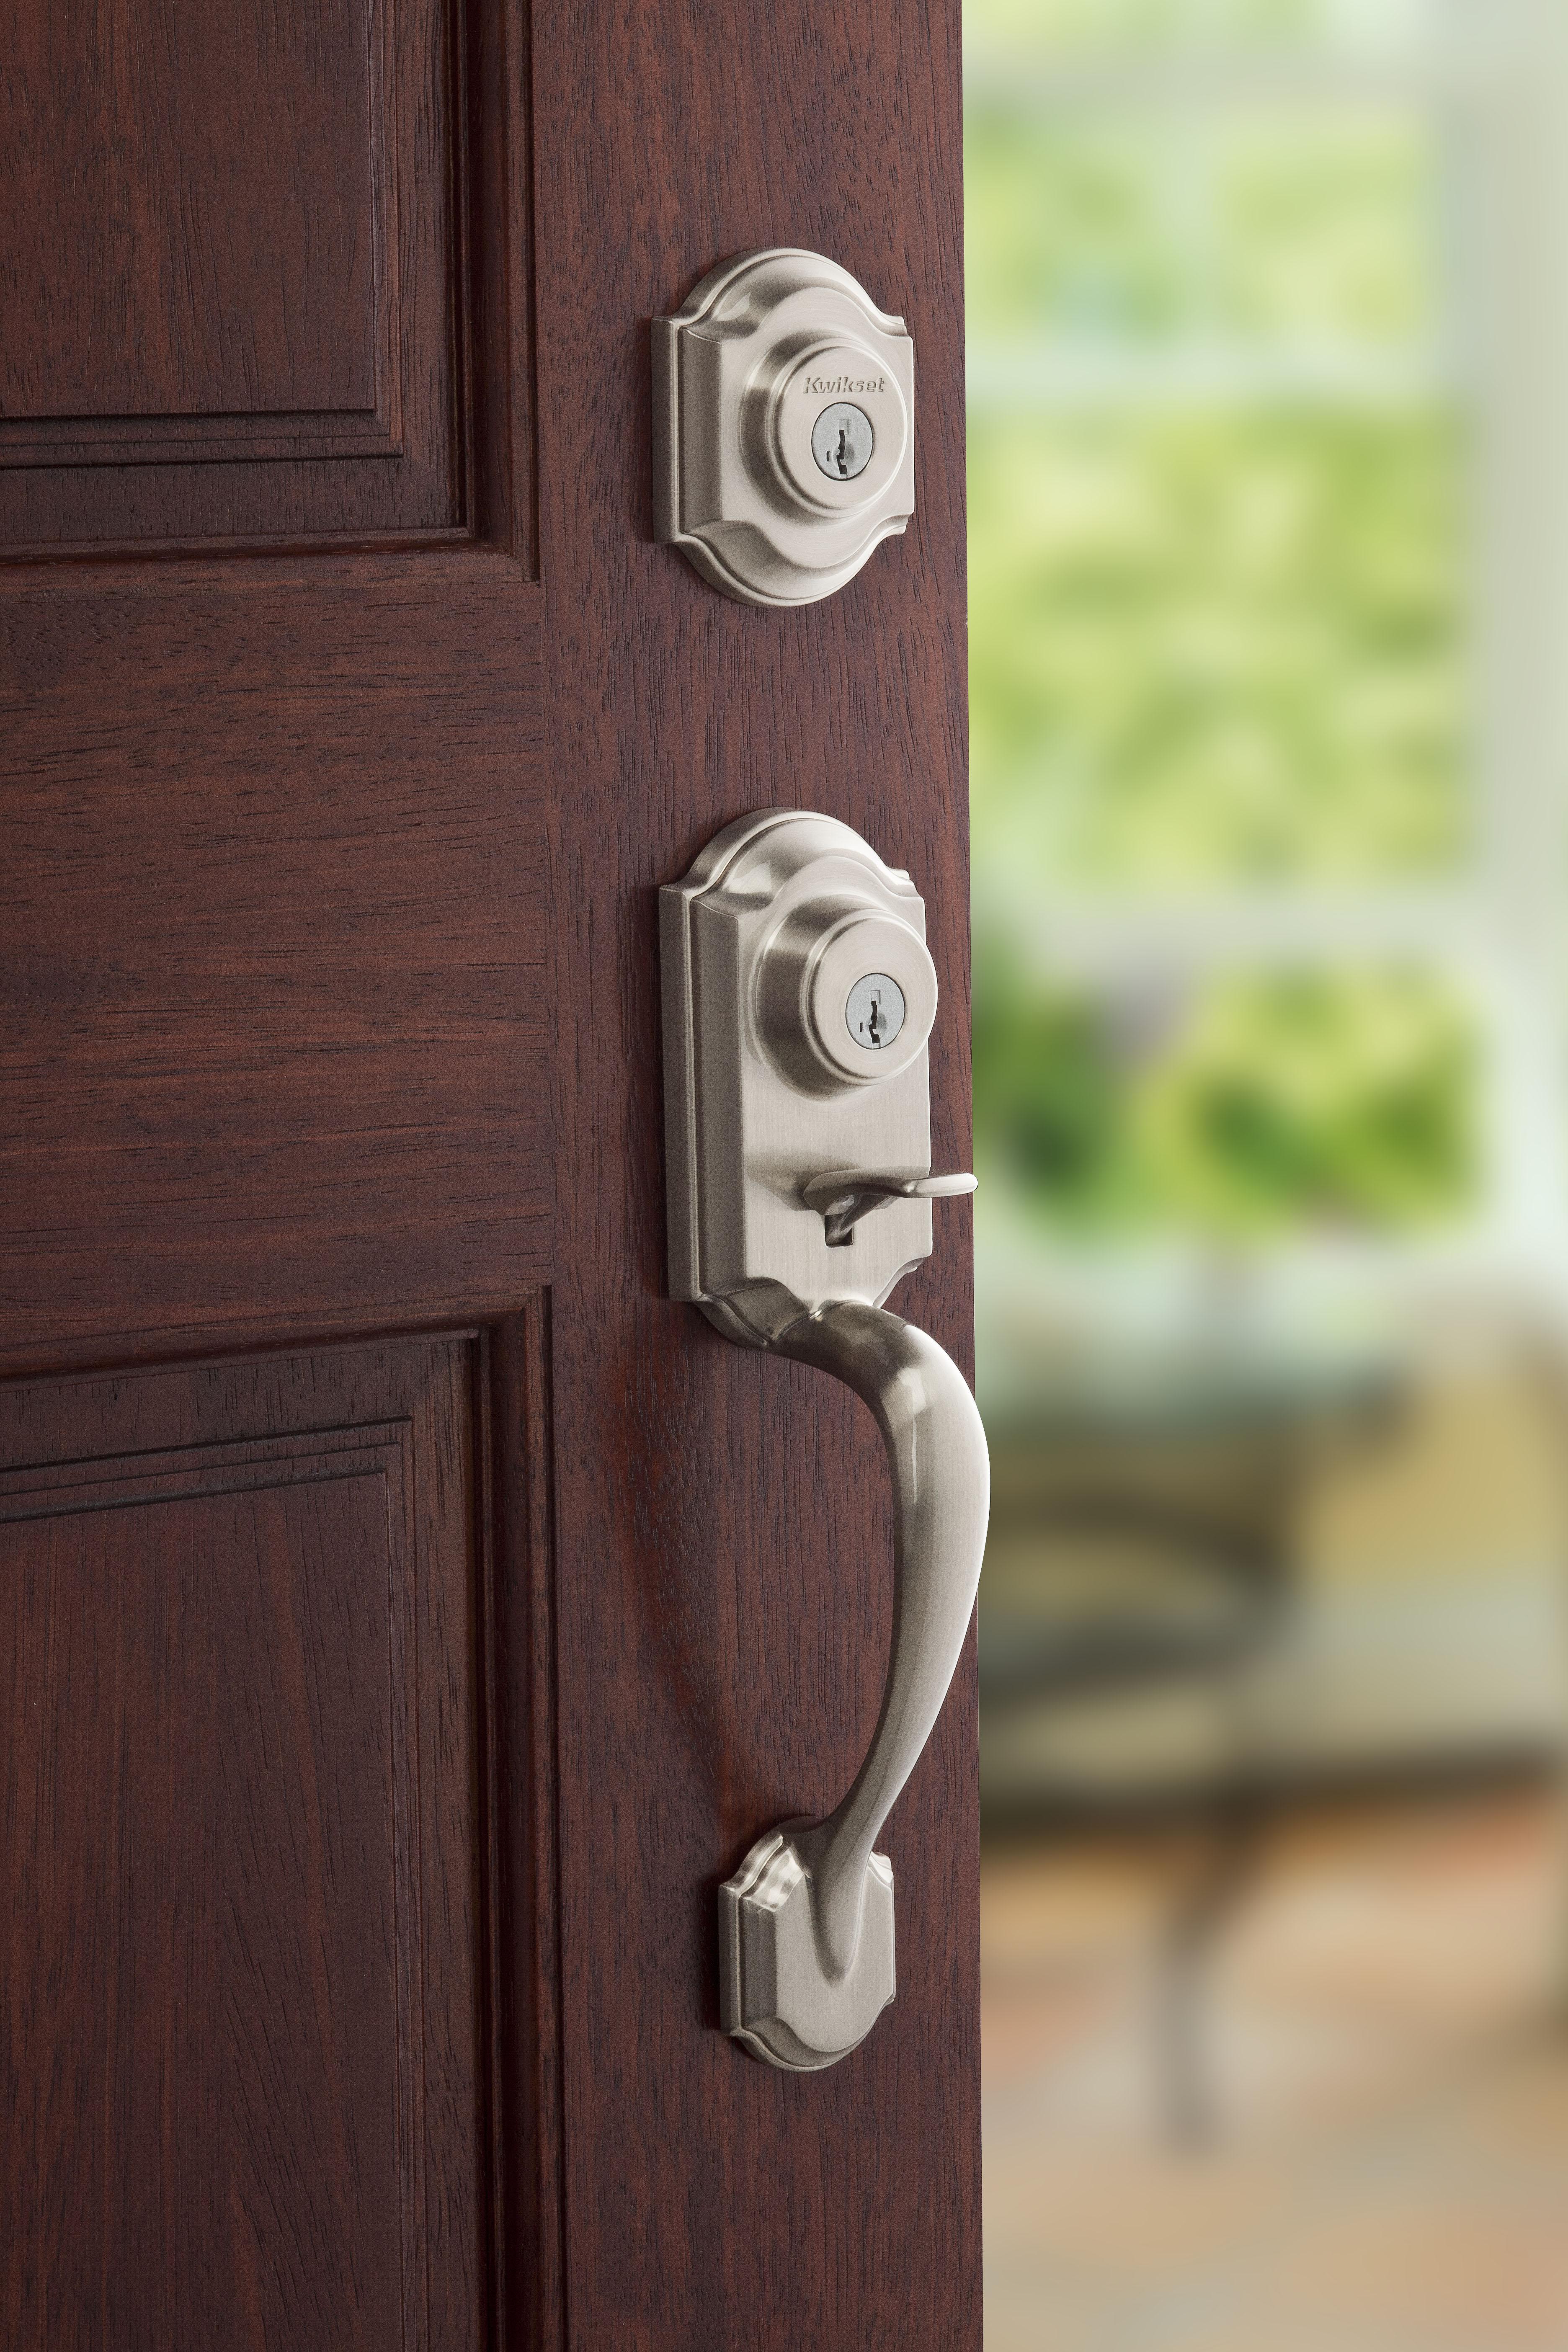 Handleset Has Two Points of Locking & Handleset Has Two Points of Locking - retrofit pezcame.com